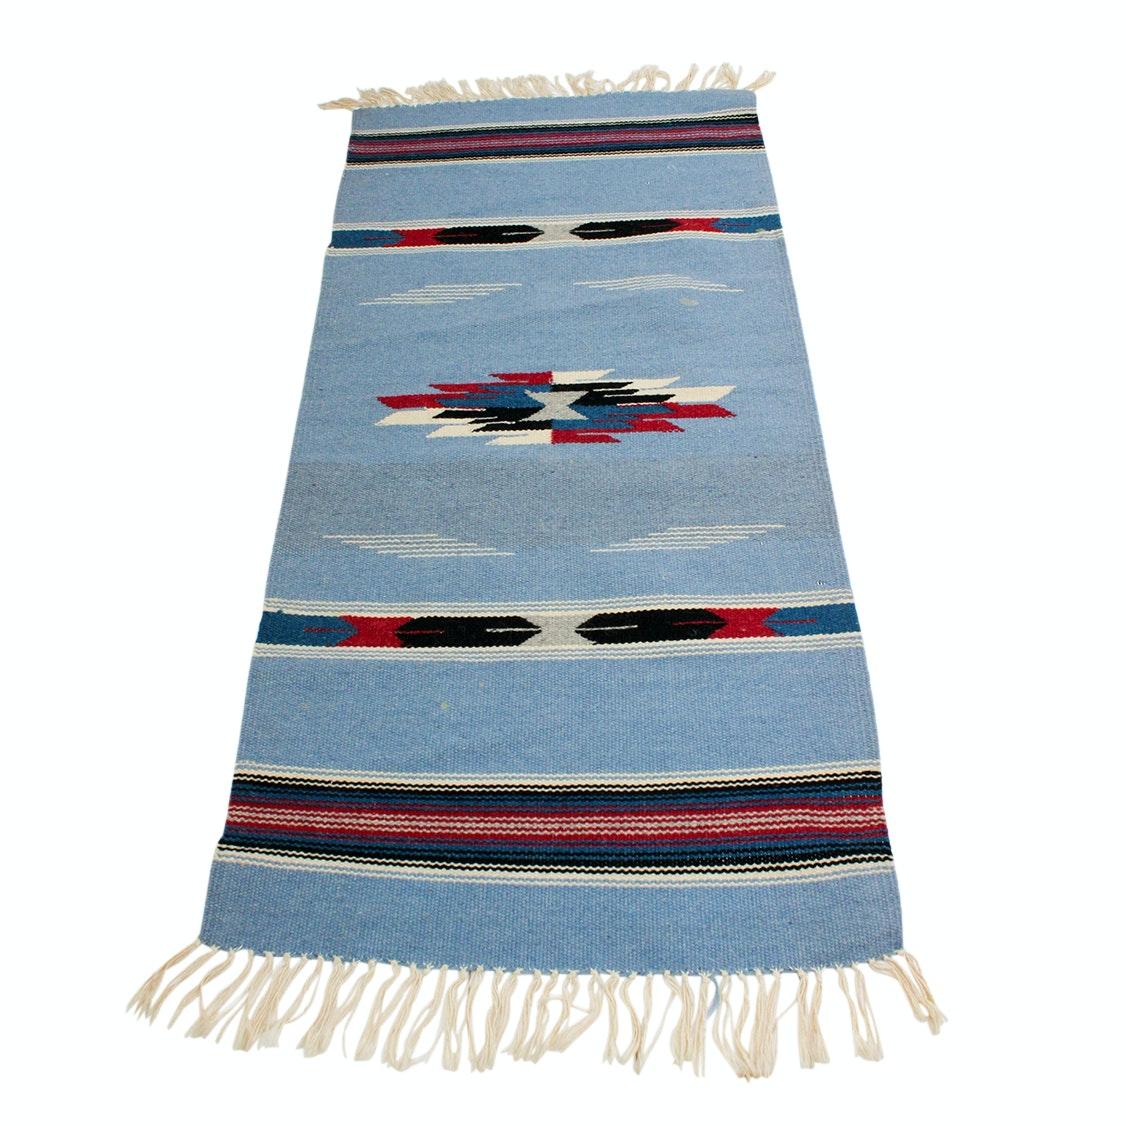 Antique Handwoven Wool Saddle Blanket